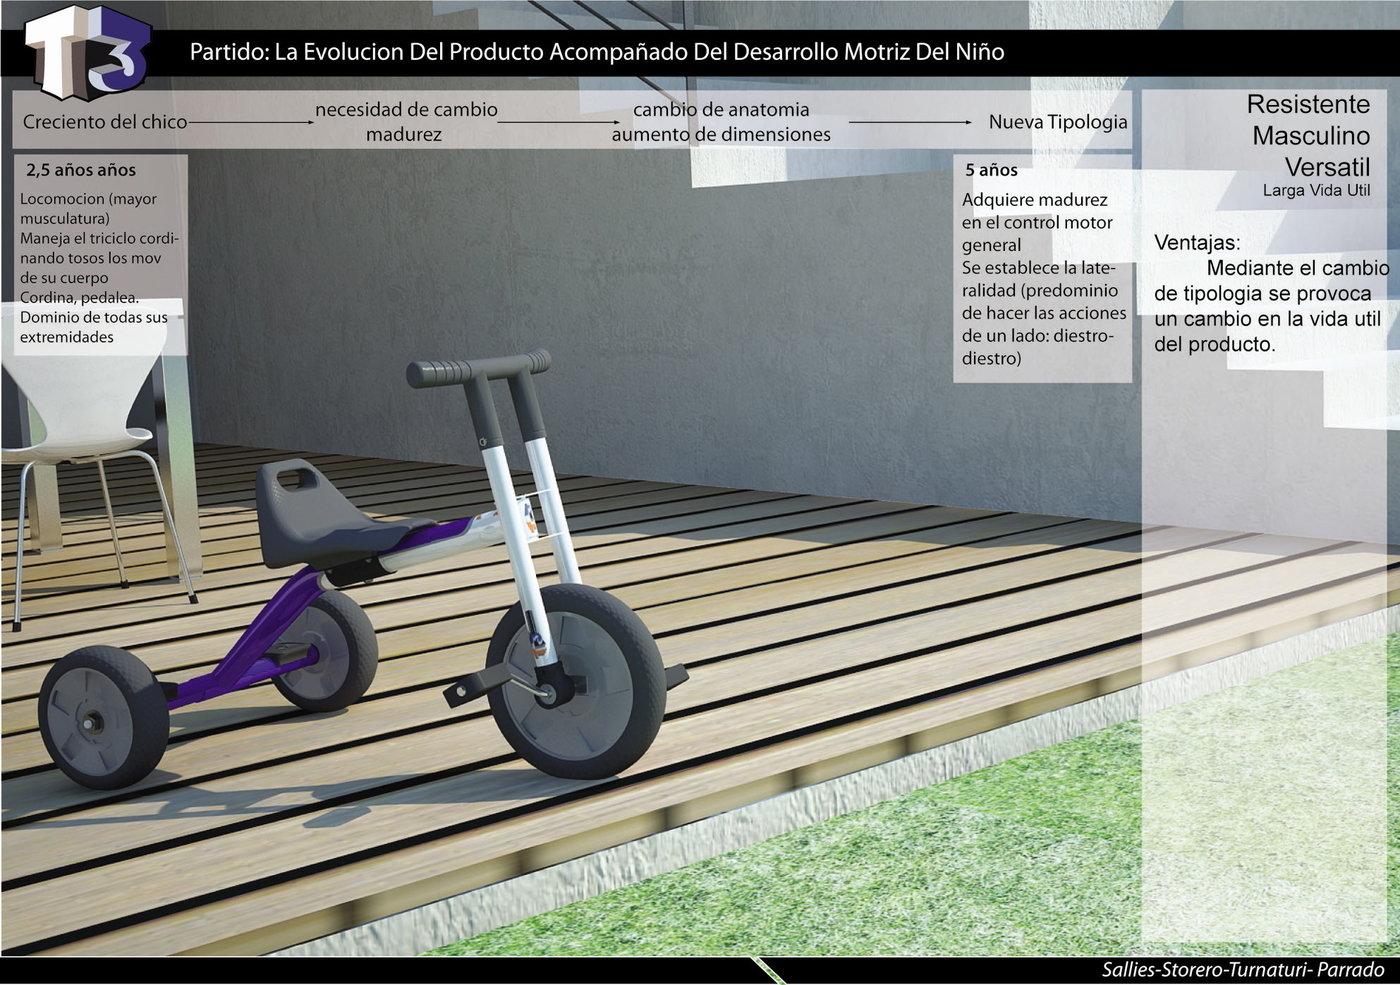 T3 Cycle by Agustin Sallies at Coroflot com